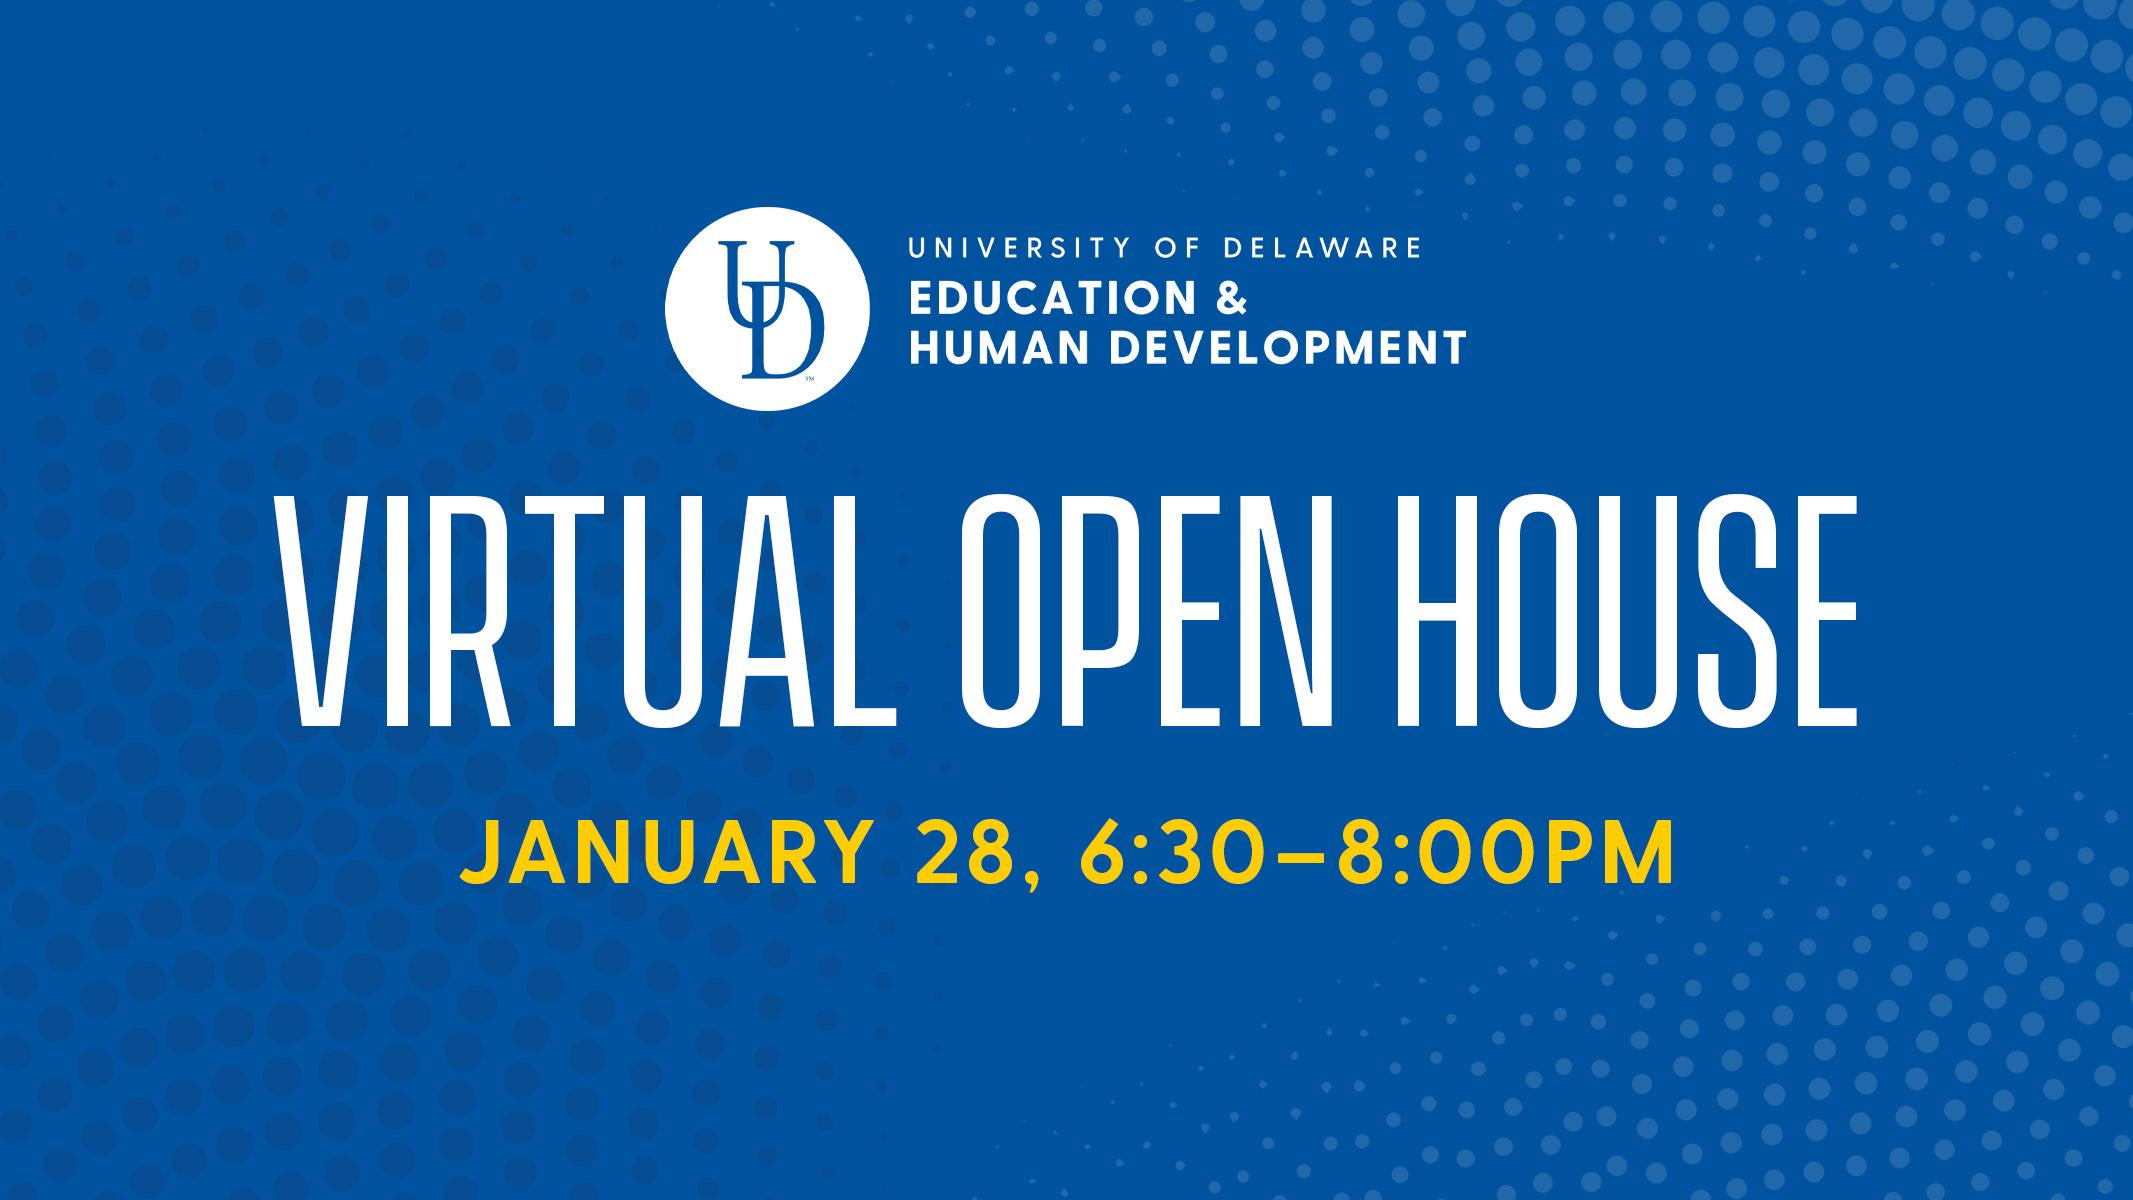 Virtual Open House on January 28, 2021